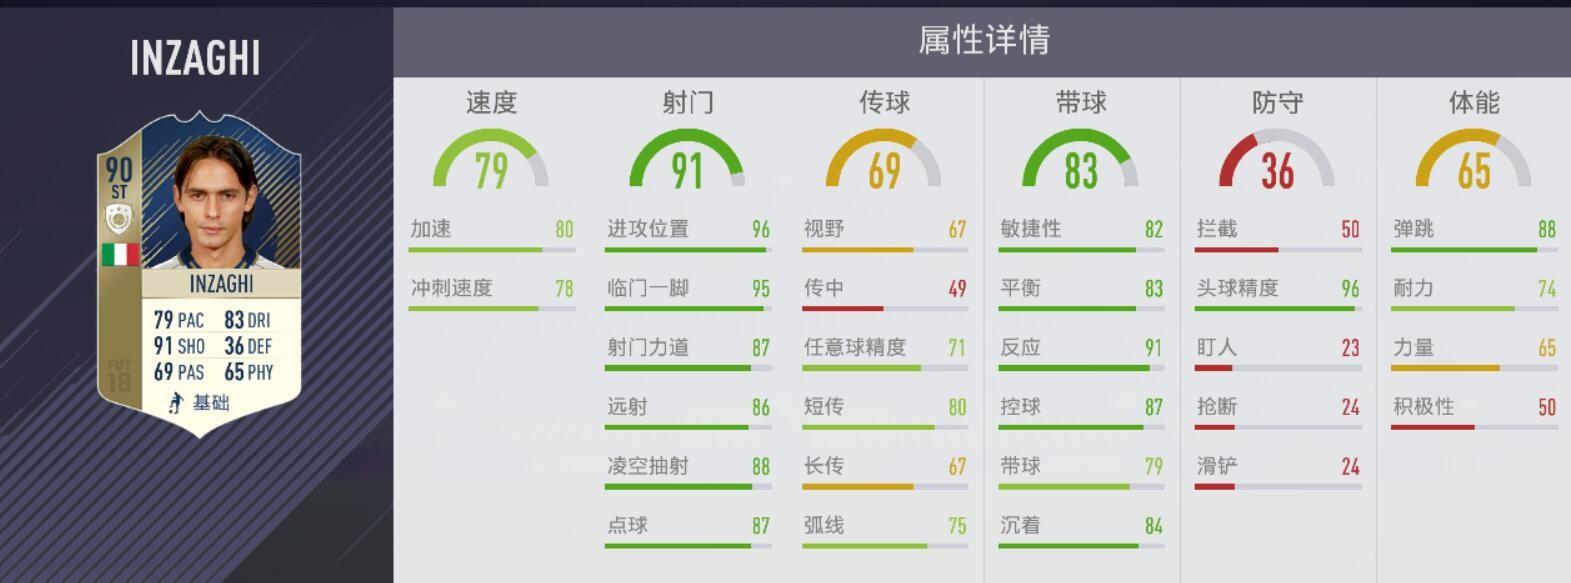 FIFA 18传奇之因扎吉:越位线上的幽灵,你现在过